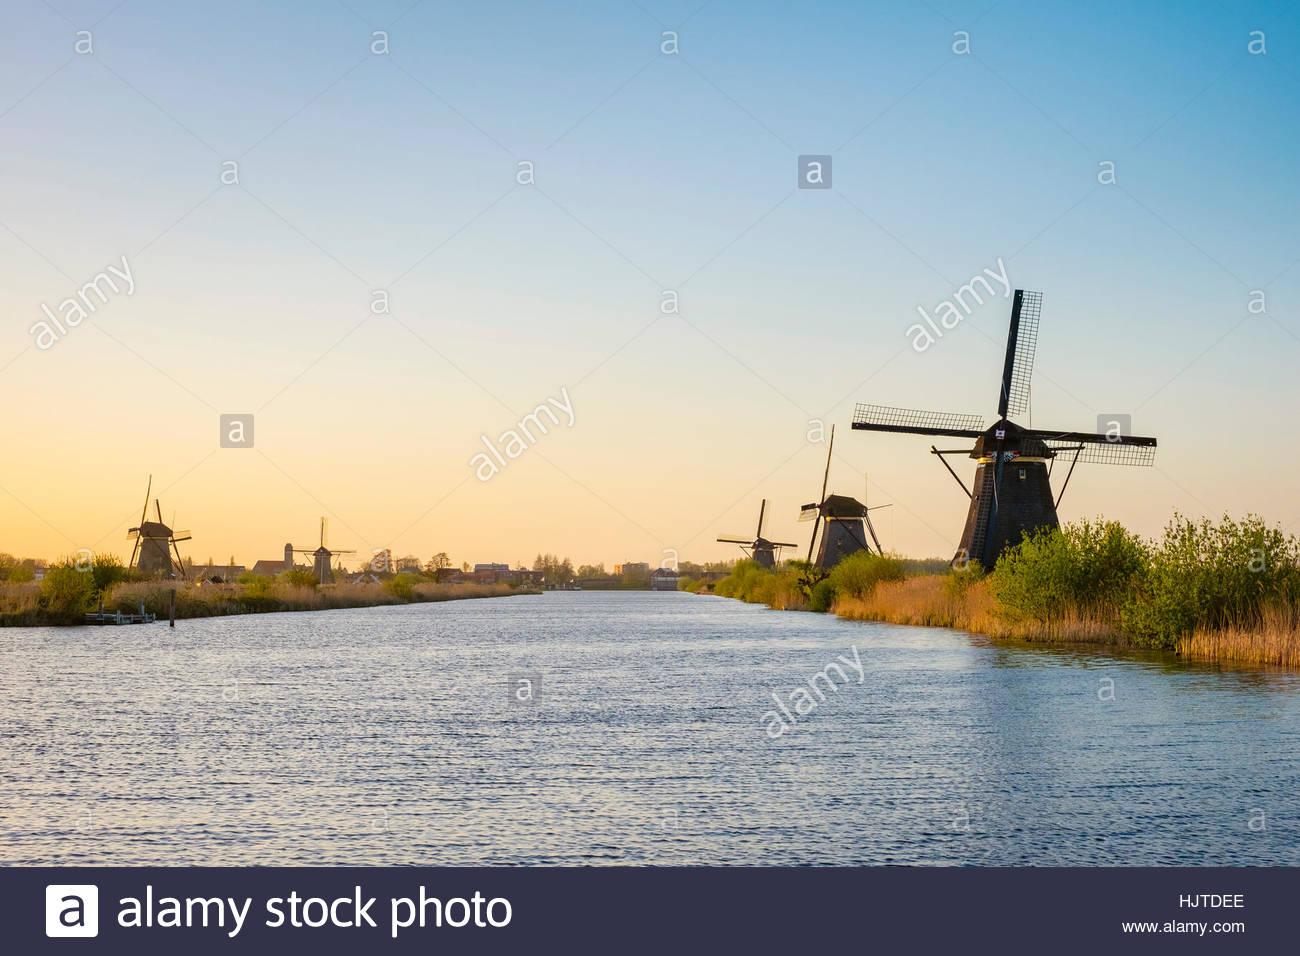 Netherlands, South Holland, Kinderdijk, UNESCO World Heritage Site. Historic Dutch windmills on the polders at sunset. Stock Photo